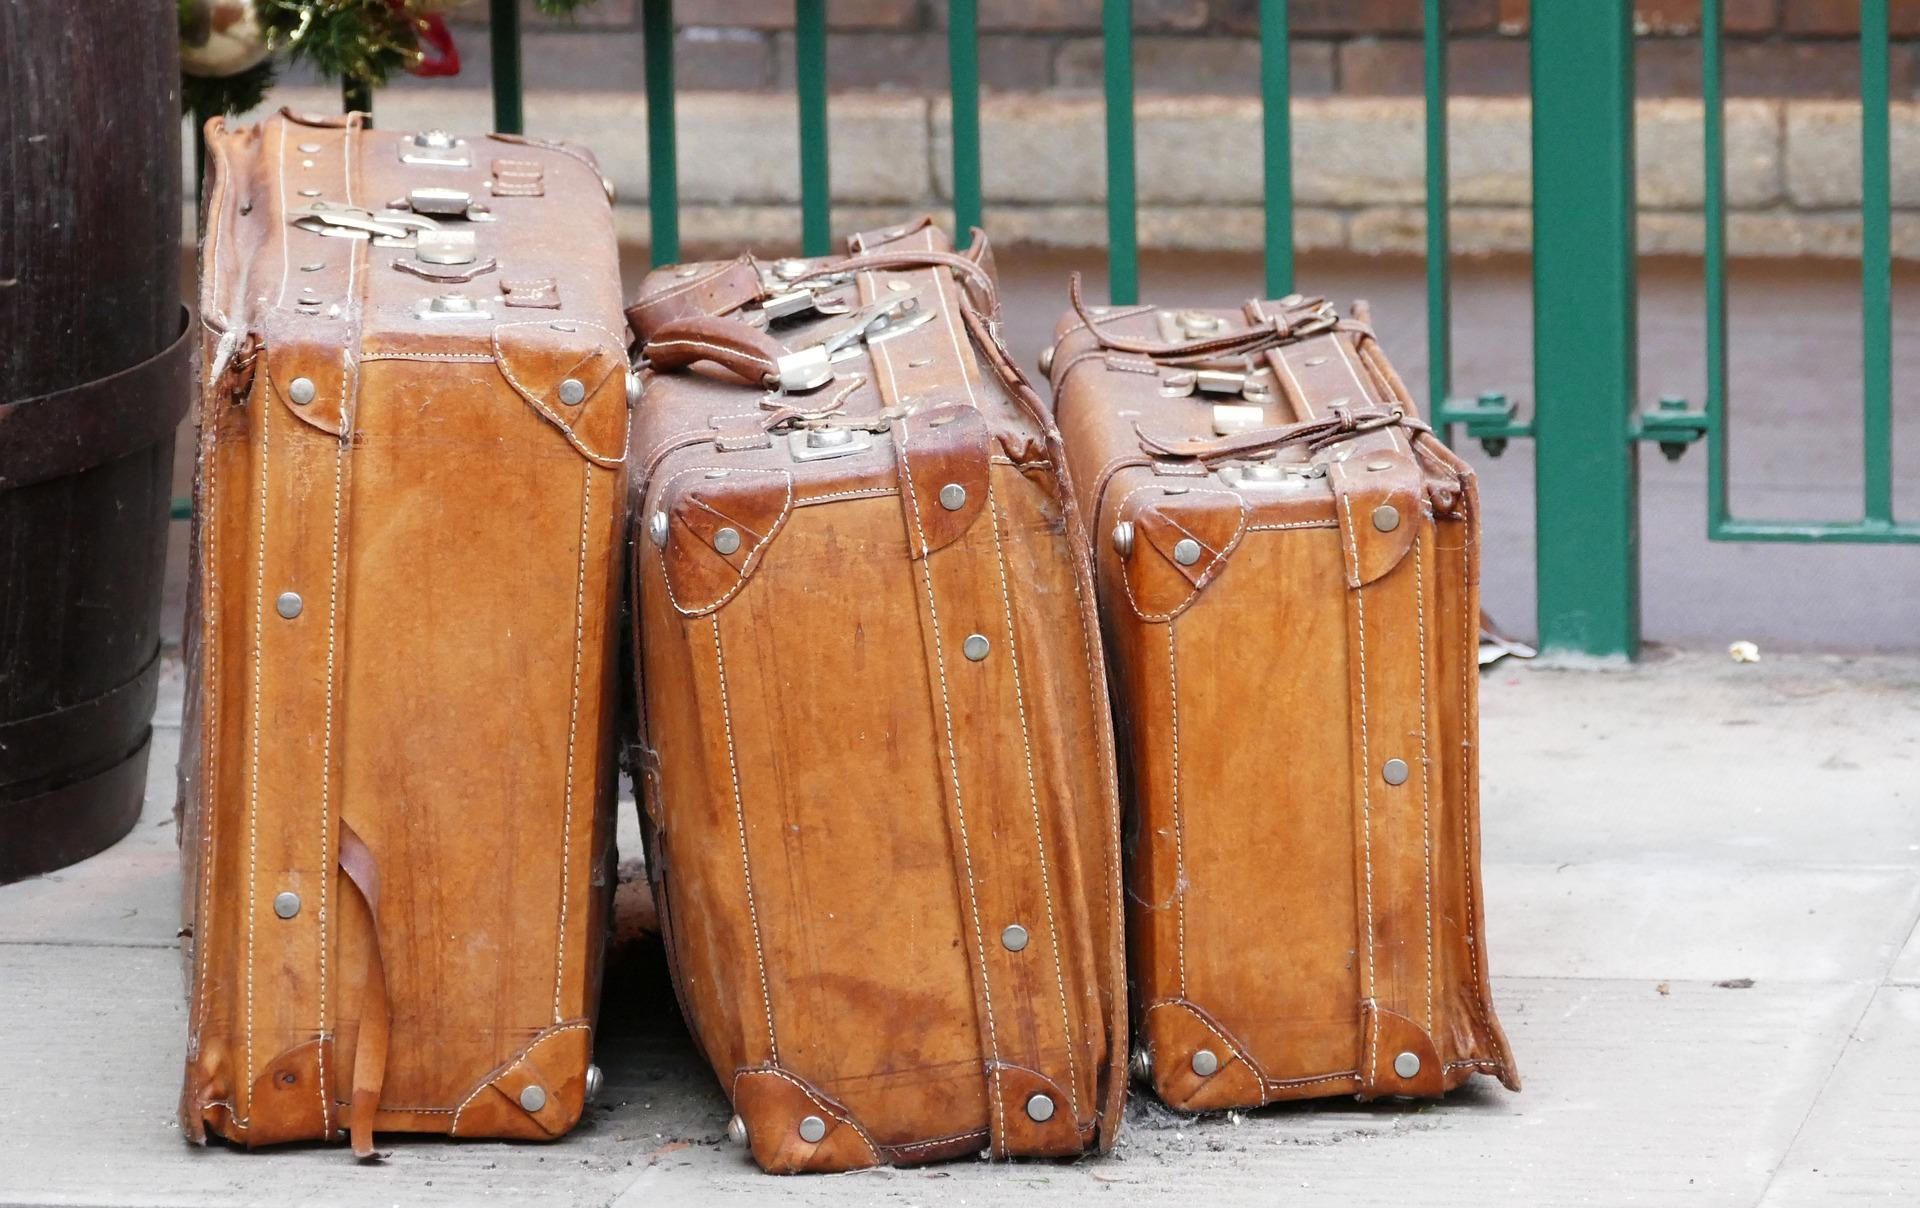 Luggage. Credit: Inspiredimages / Pixabay. Licenza: CC0.